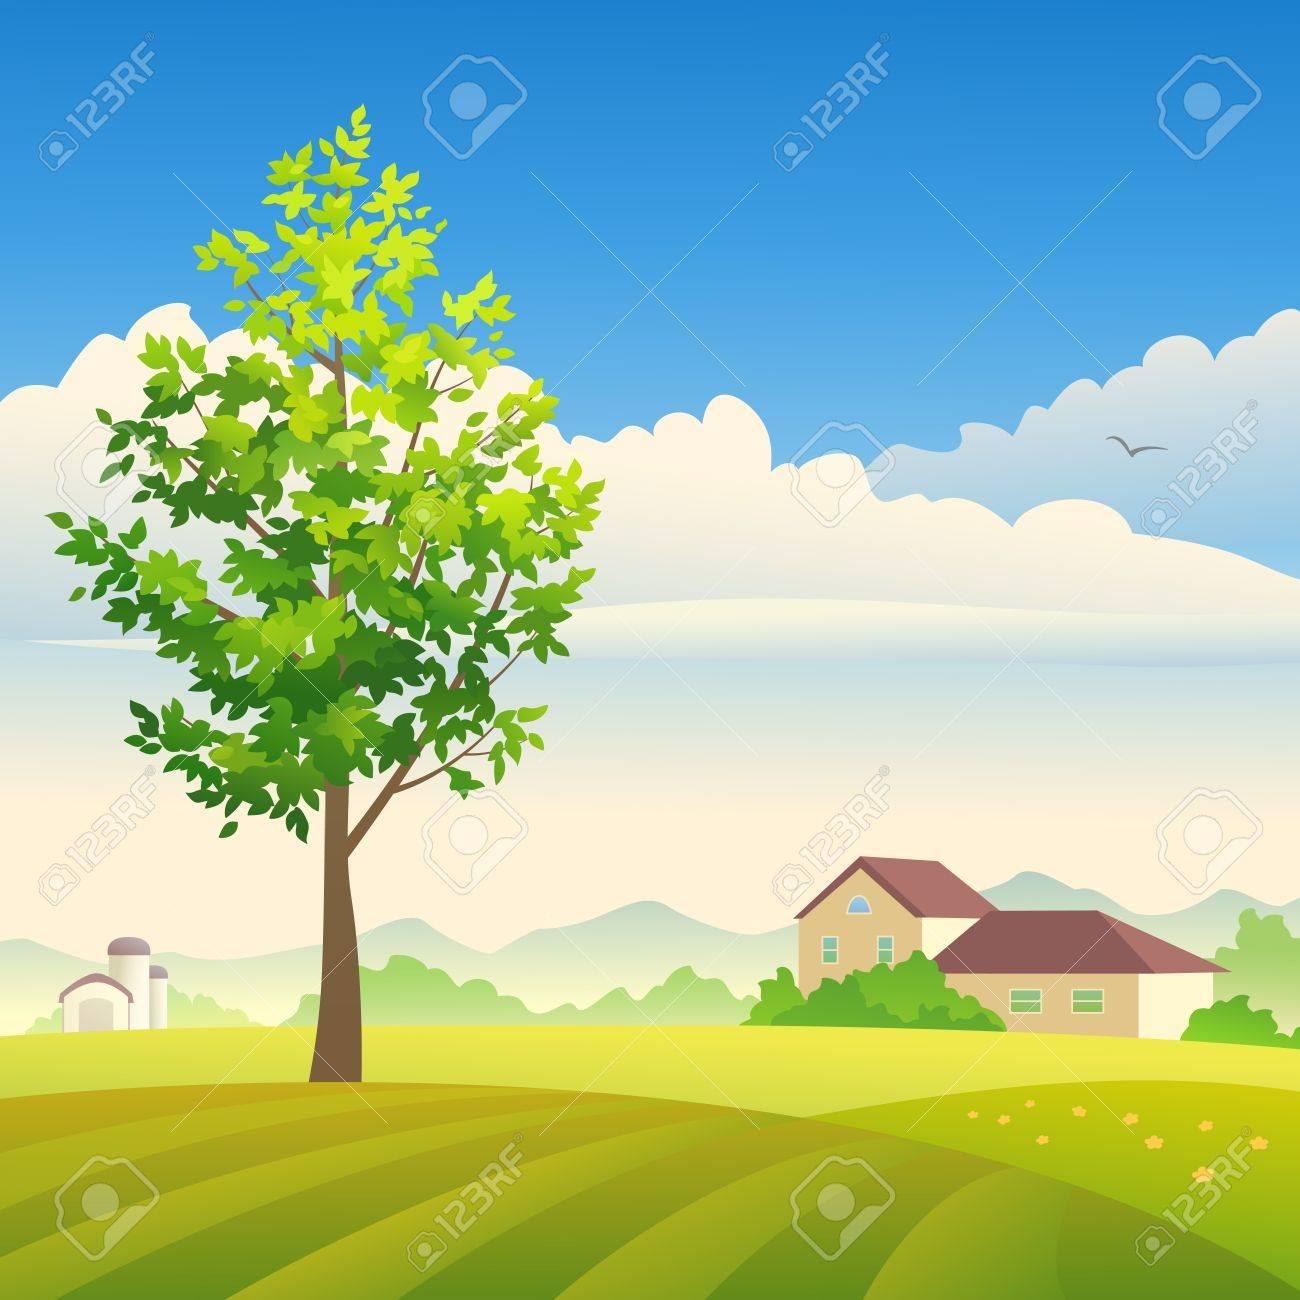 Vector illustration of a summer or spring farm. - 20242642